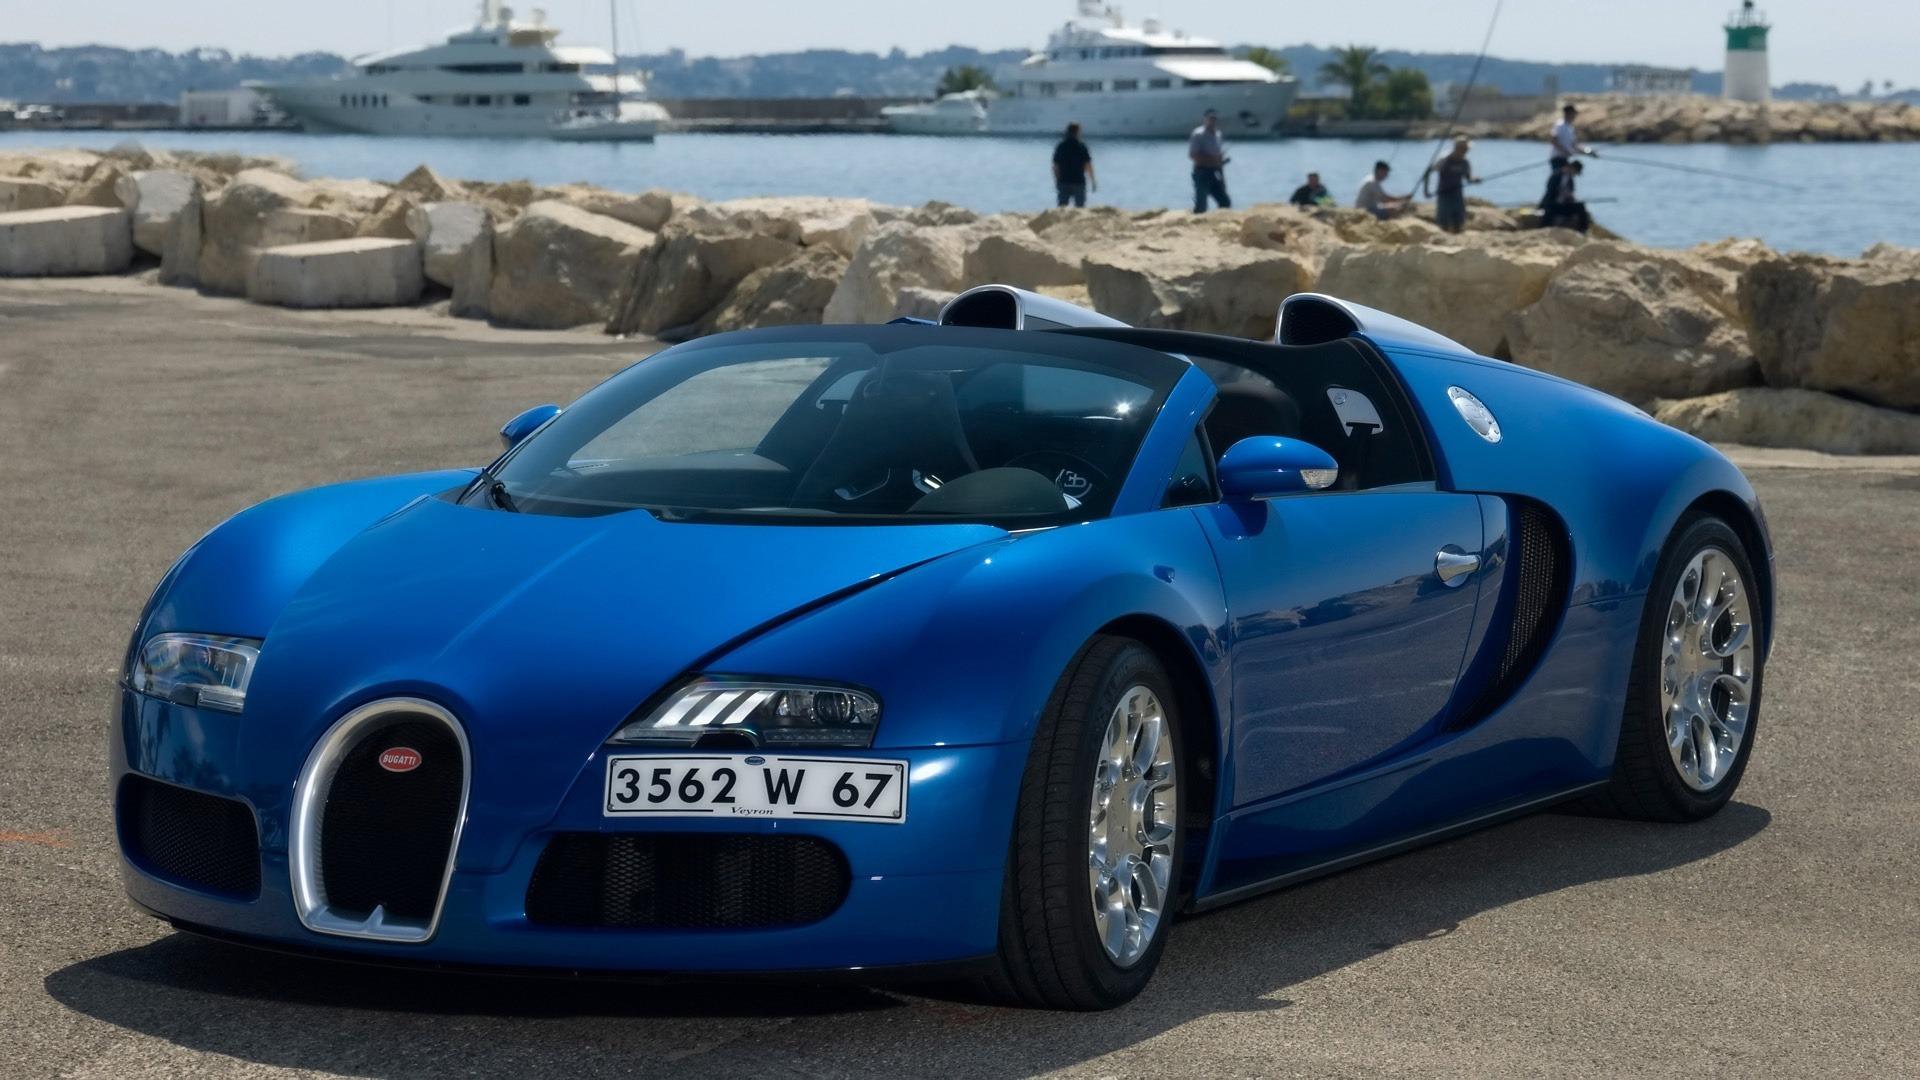 Mobil Sport Bugatti Cannes HD Wallpaper